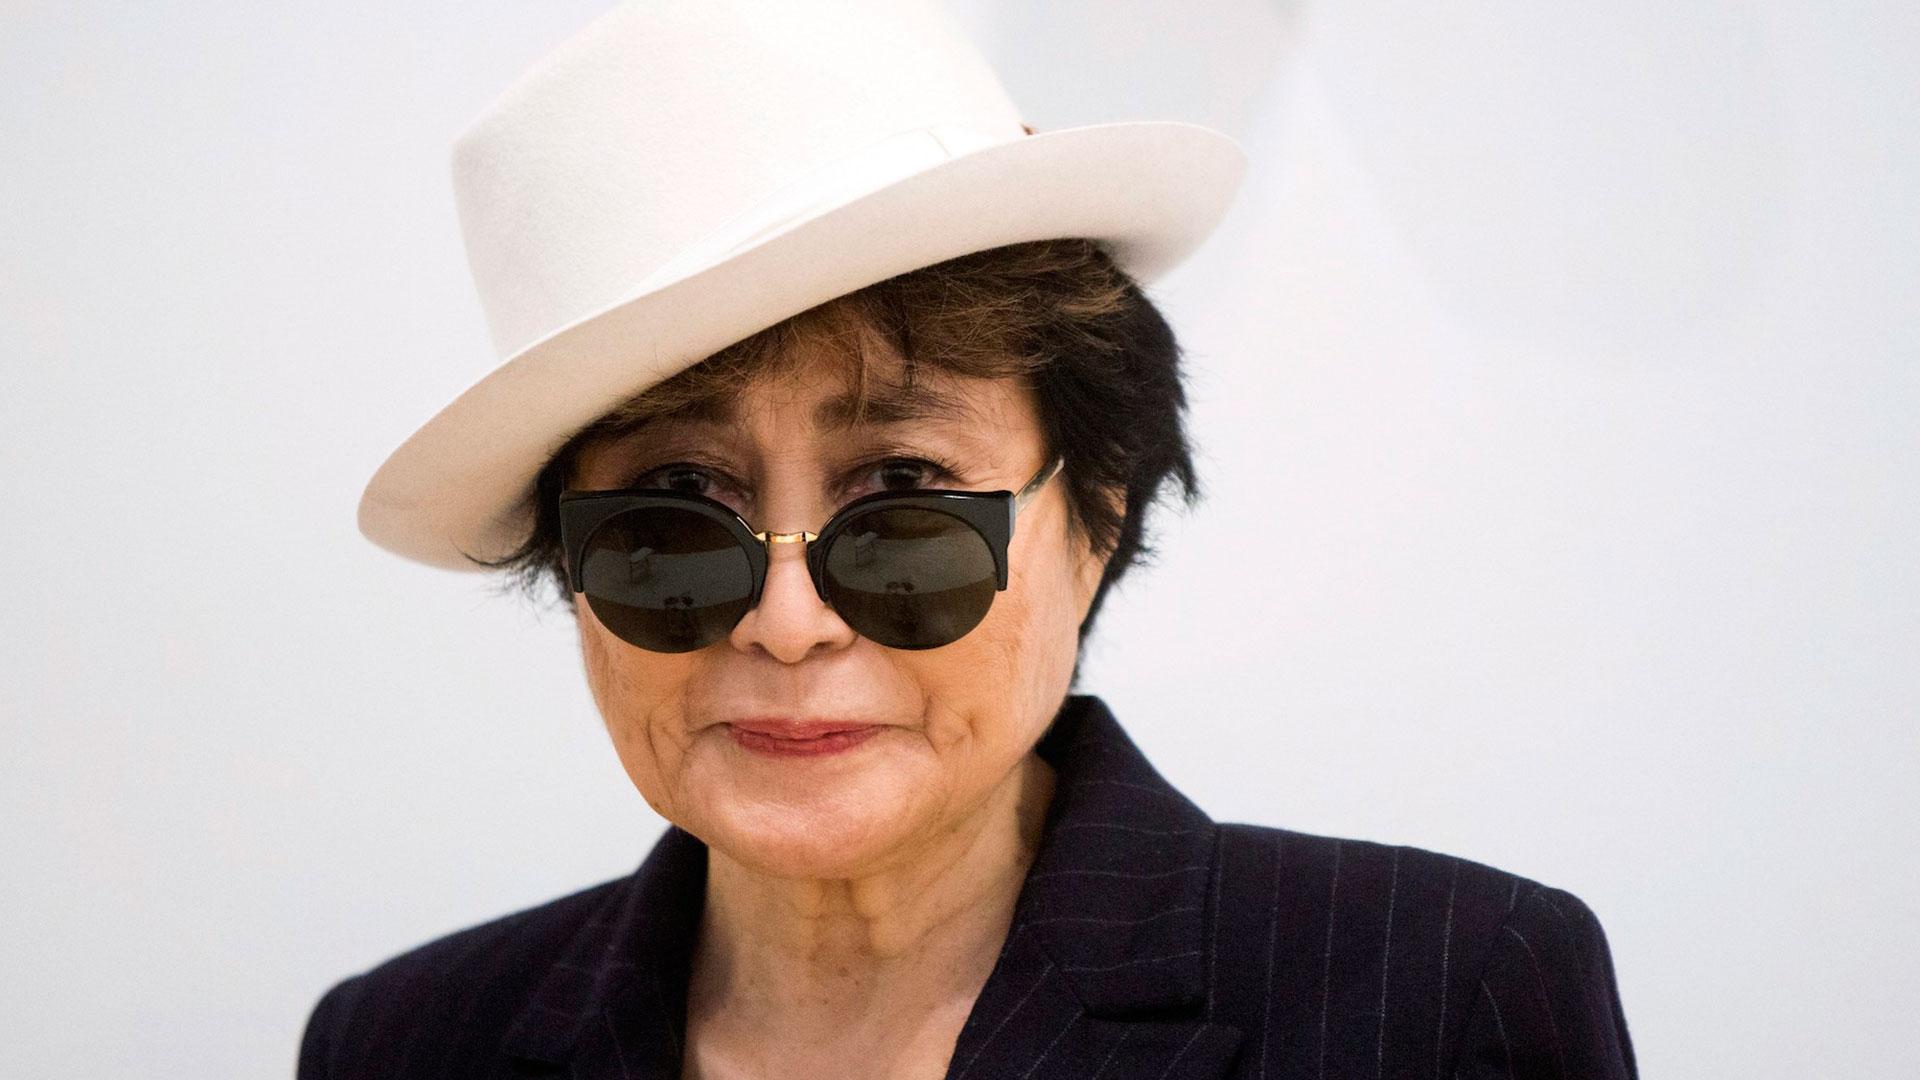 Yoko Ono hero asset